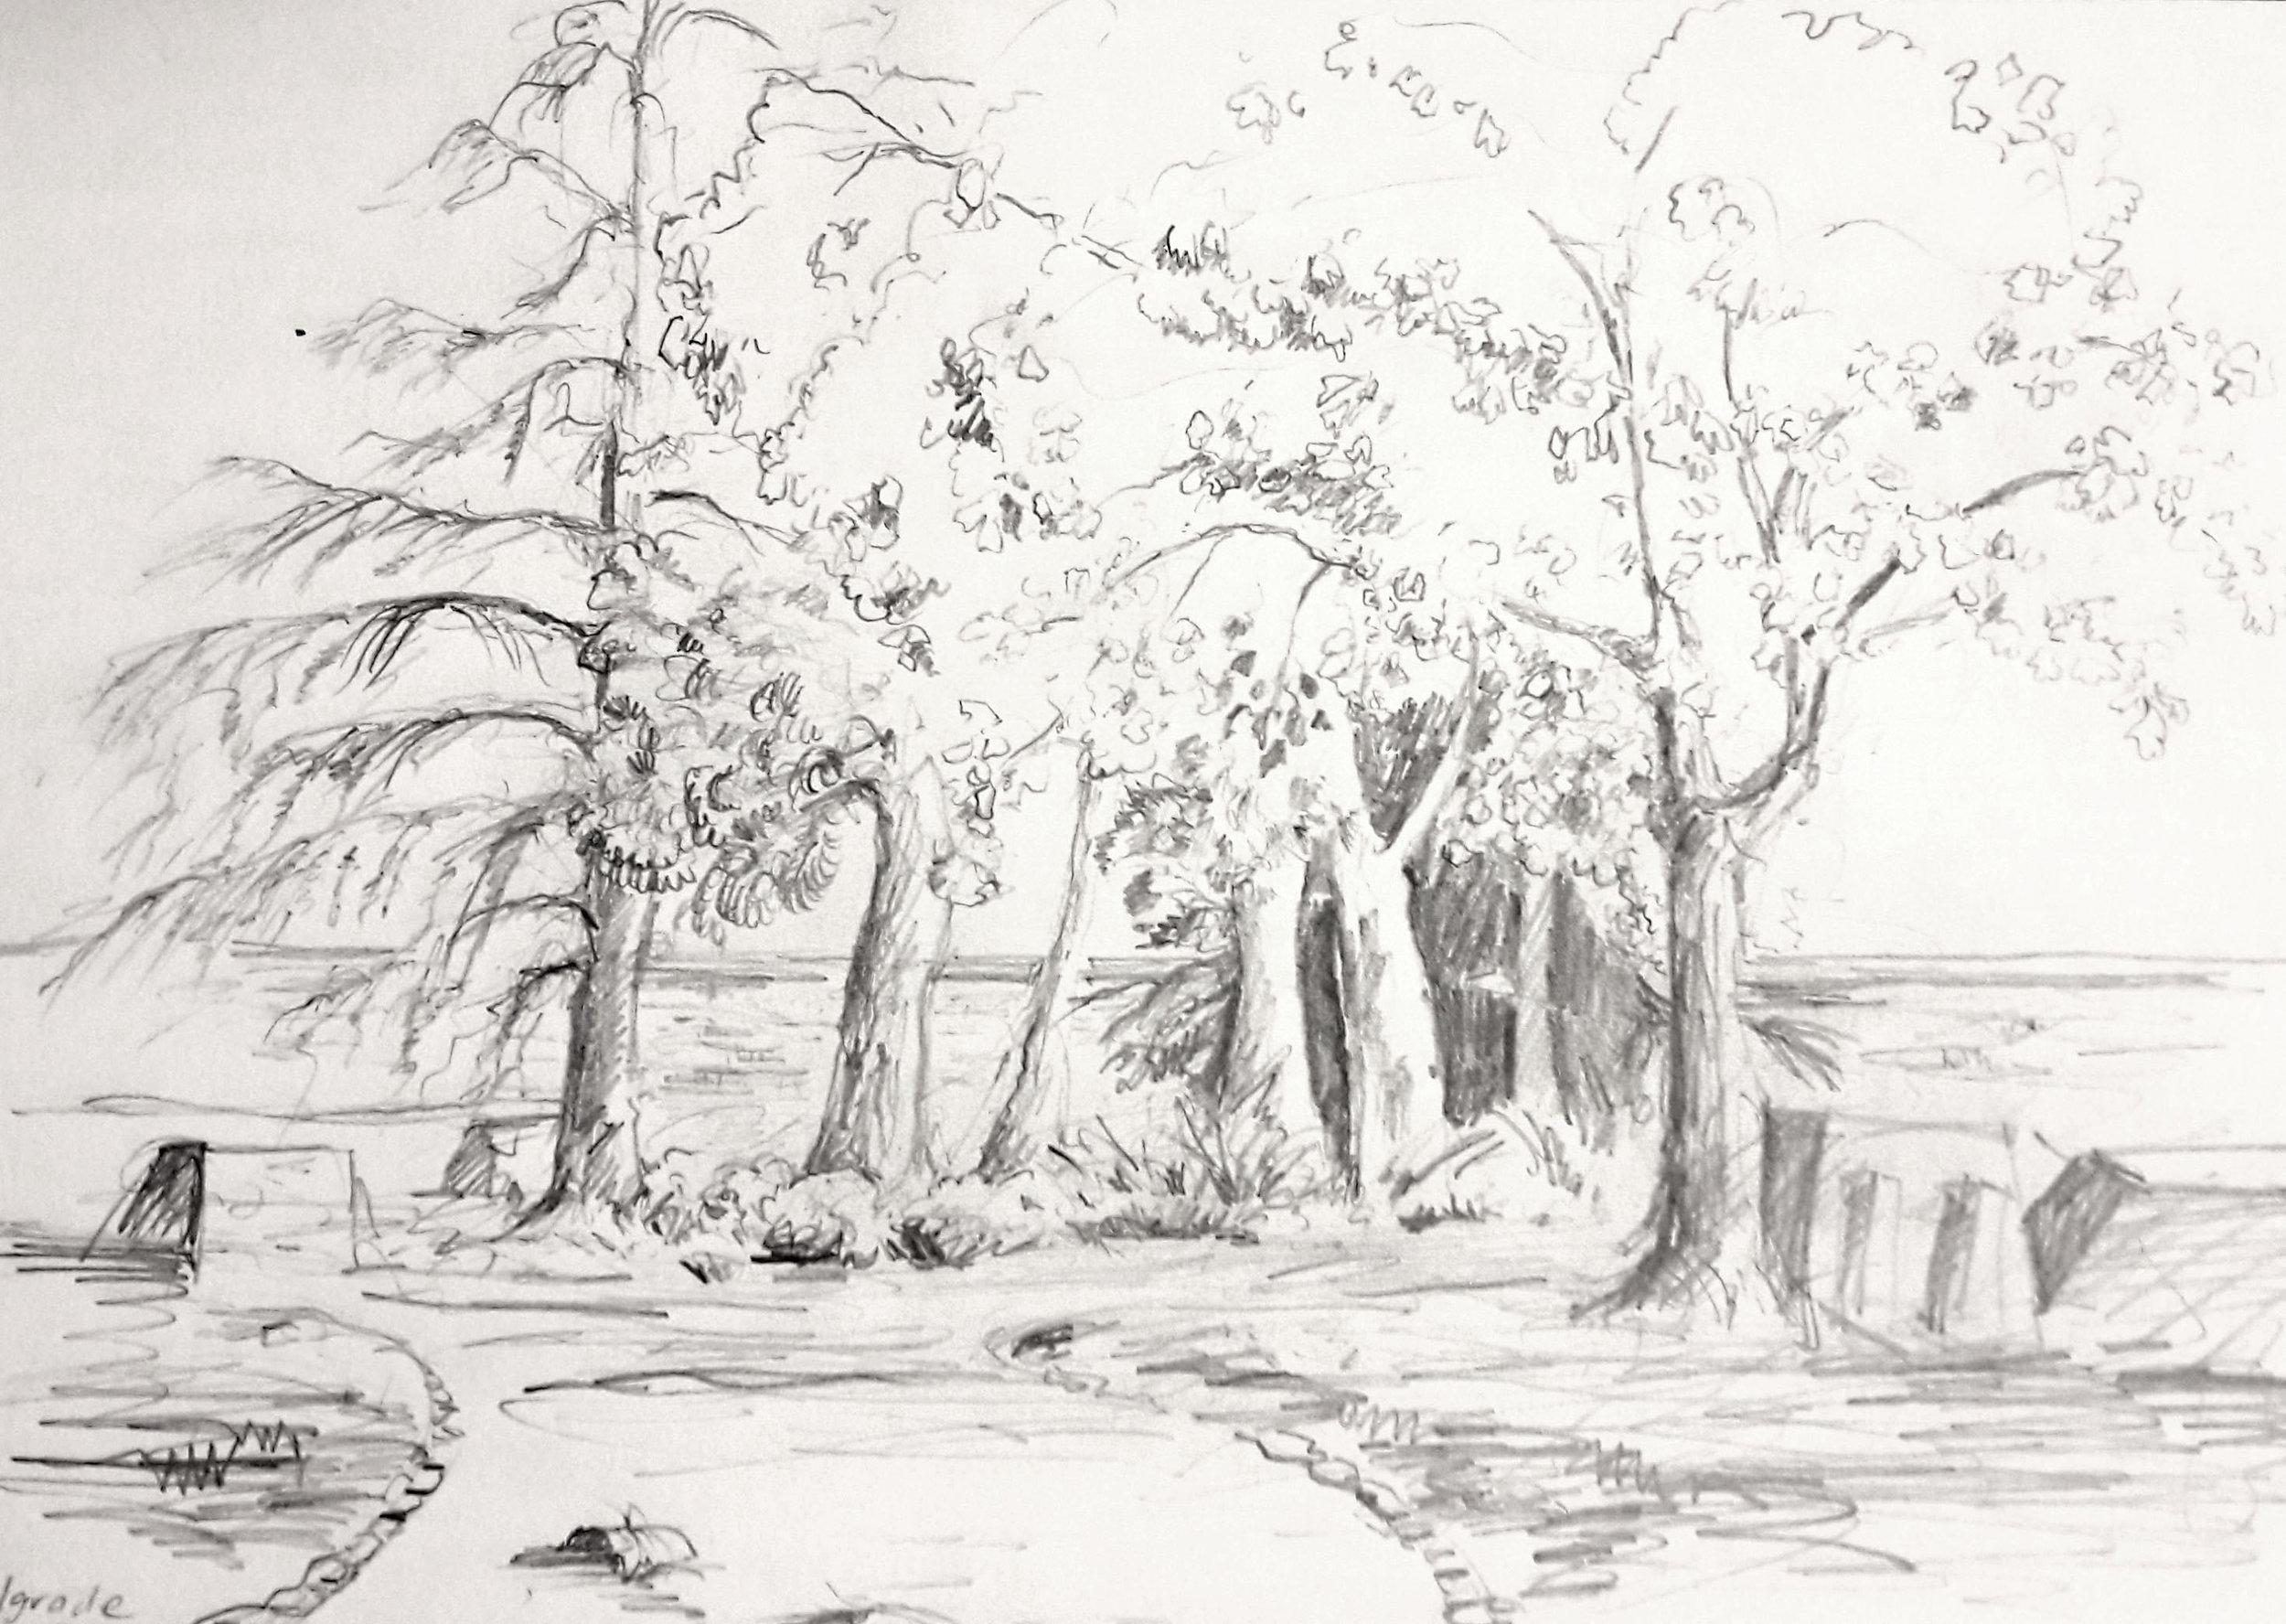 Sketch in the park by Ali Savic